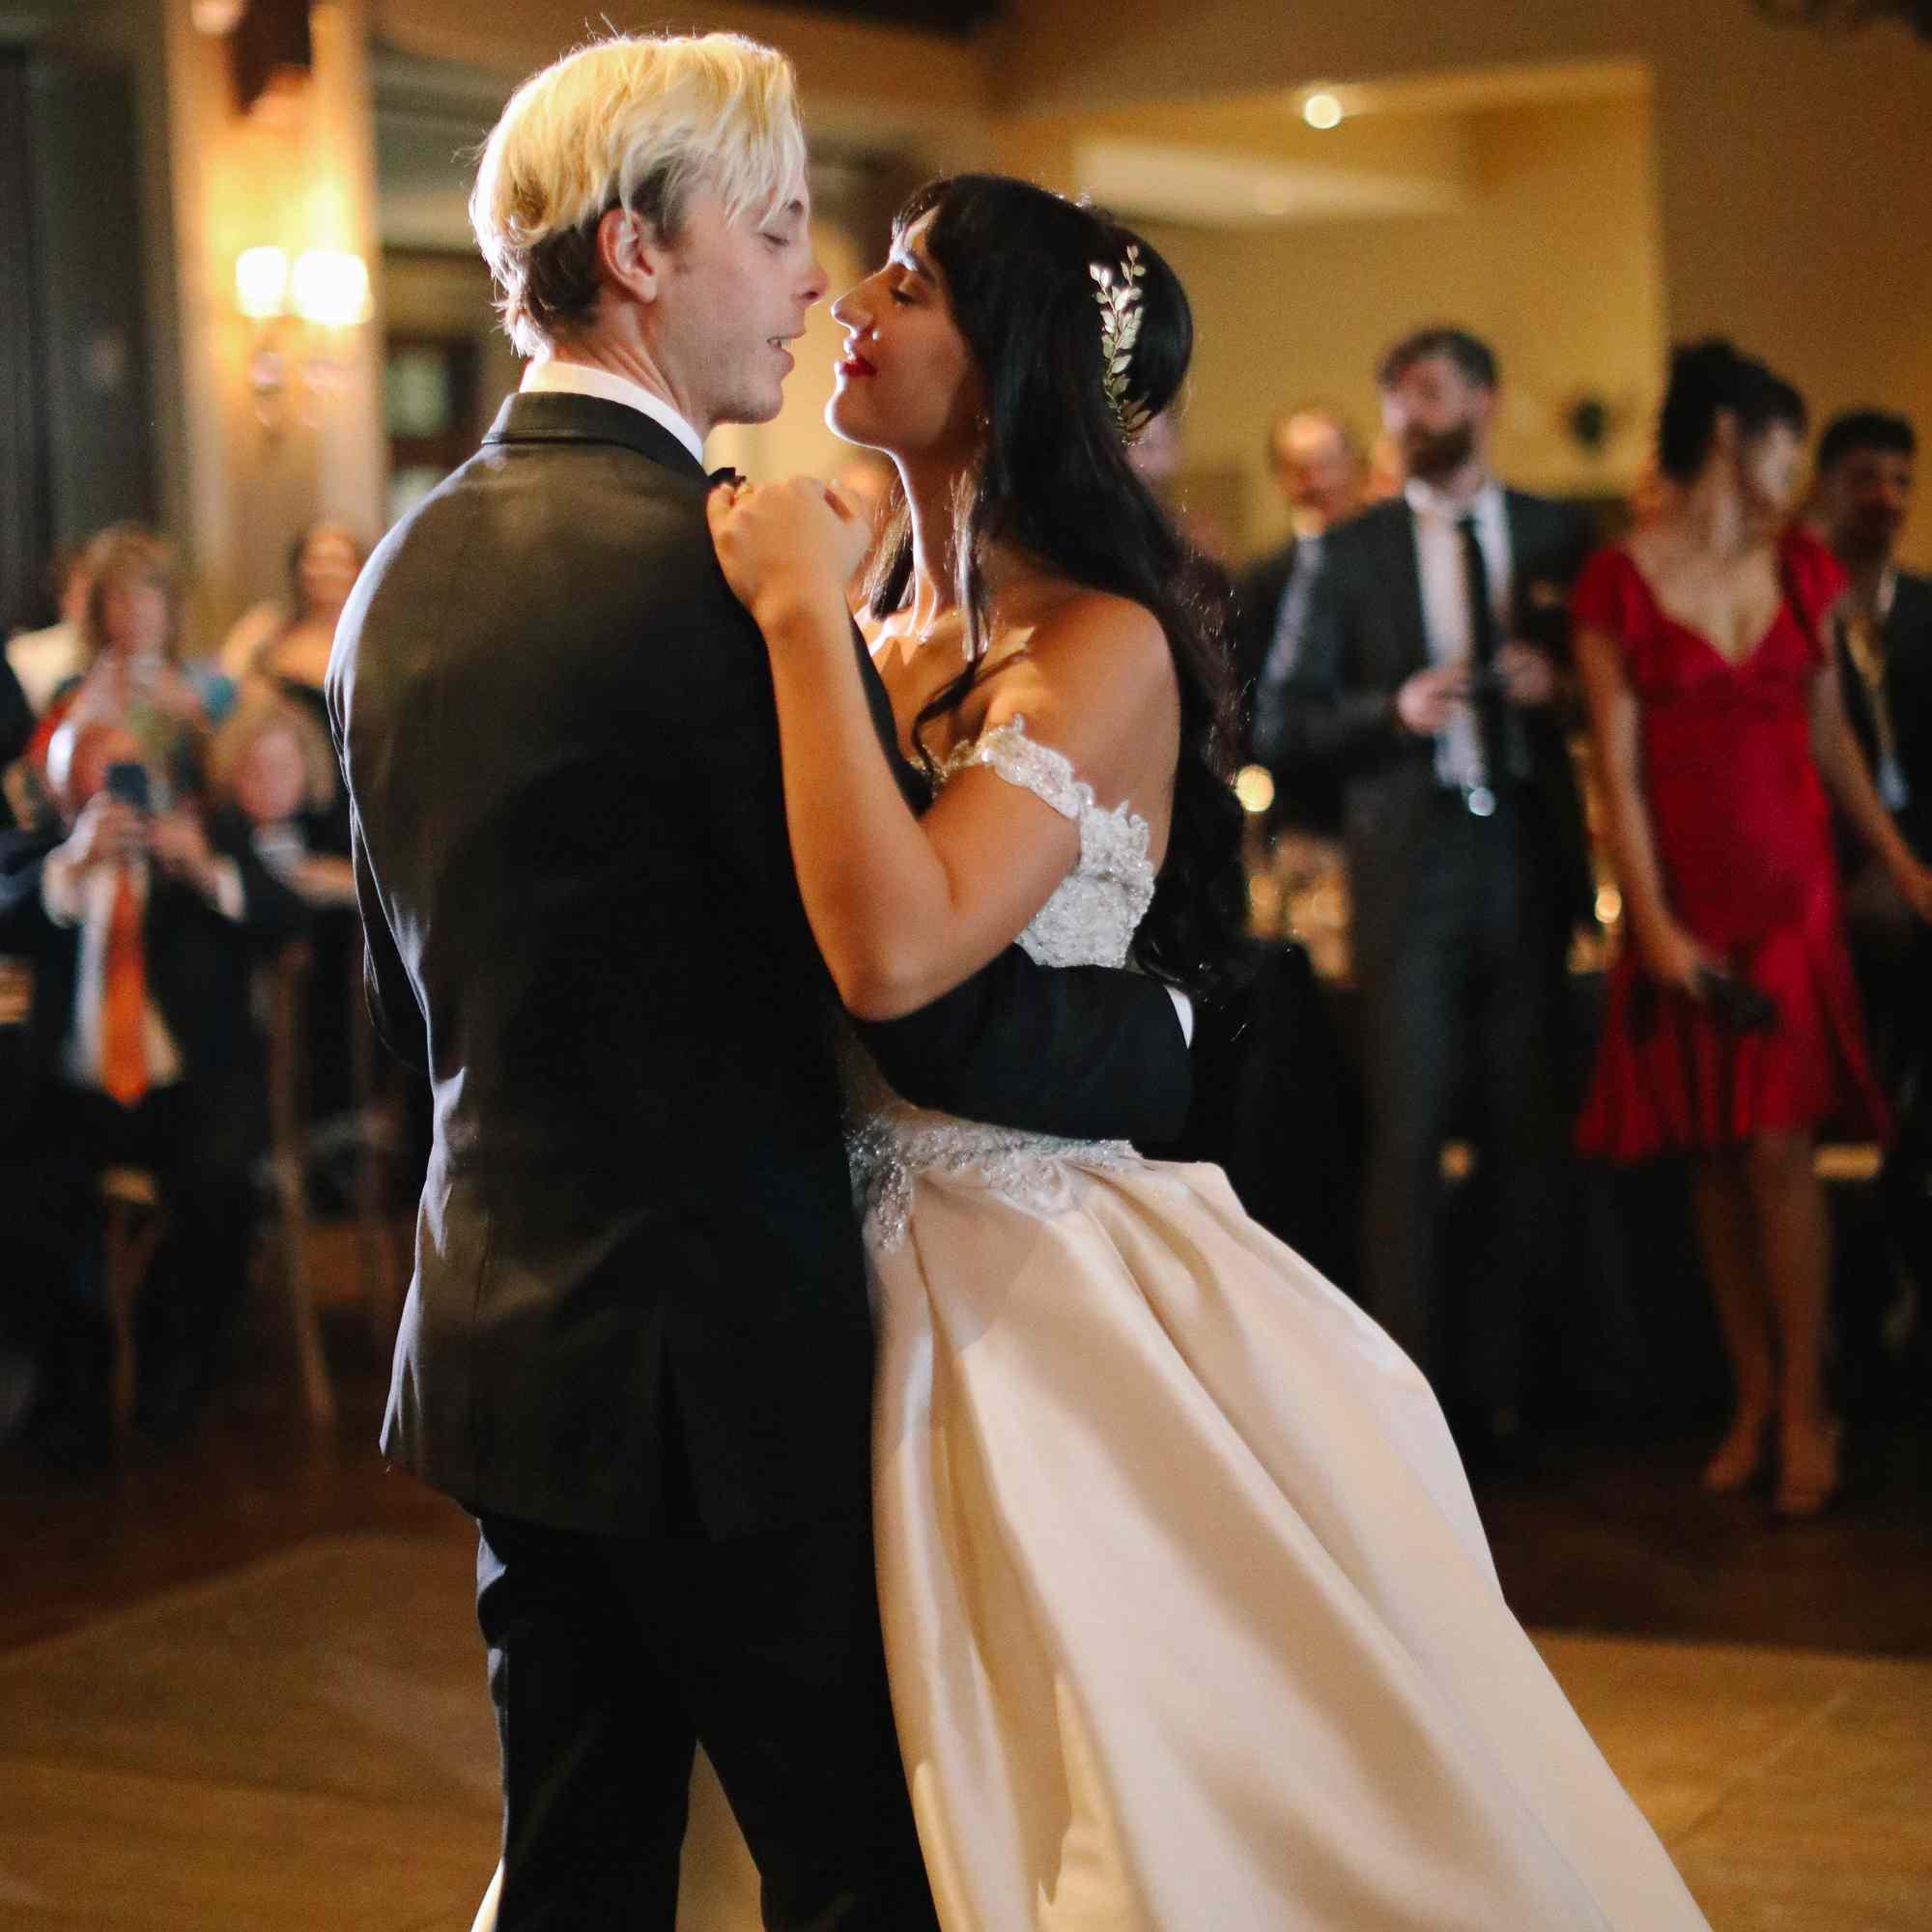 savannah and riker wedding, first dance